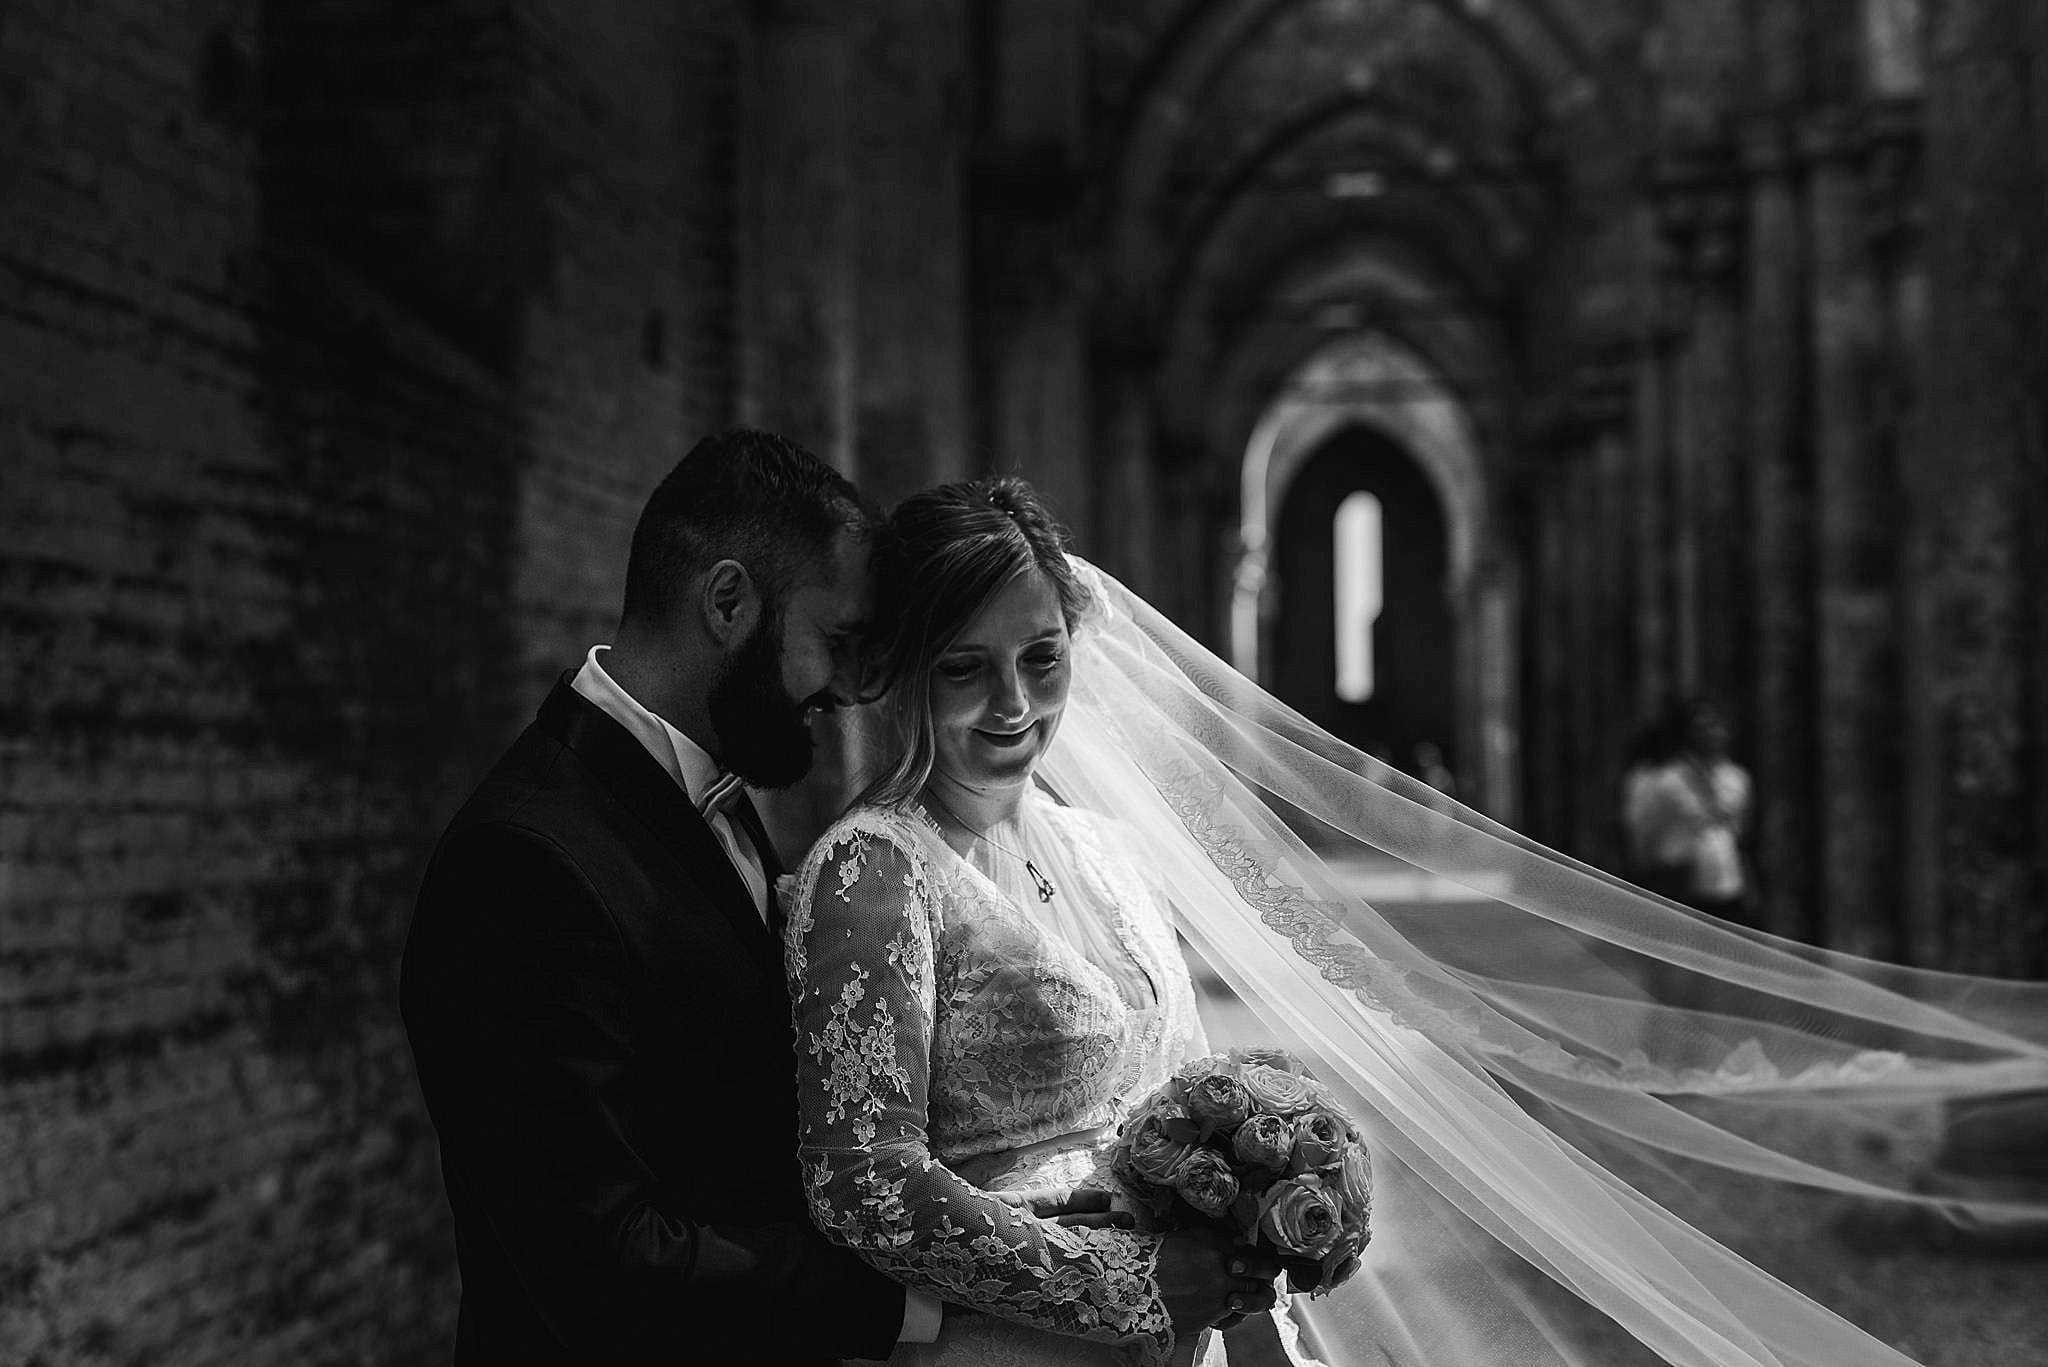 Matrimonio A Toscana : Matrimonio a san galgano toscana enrico eleonora